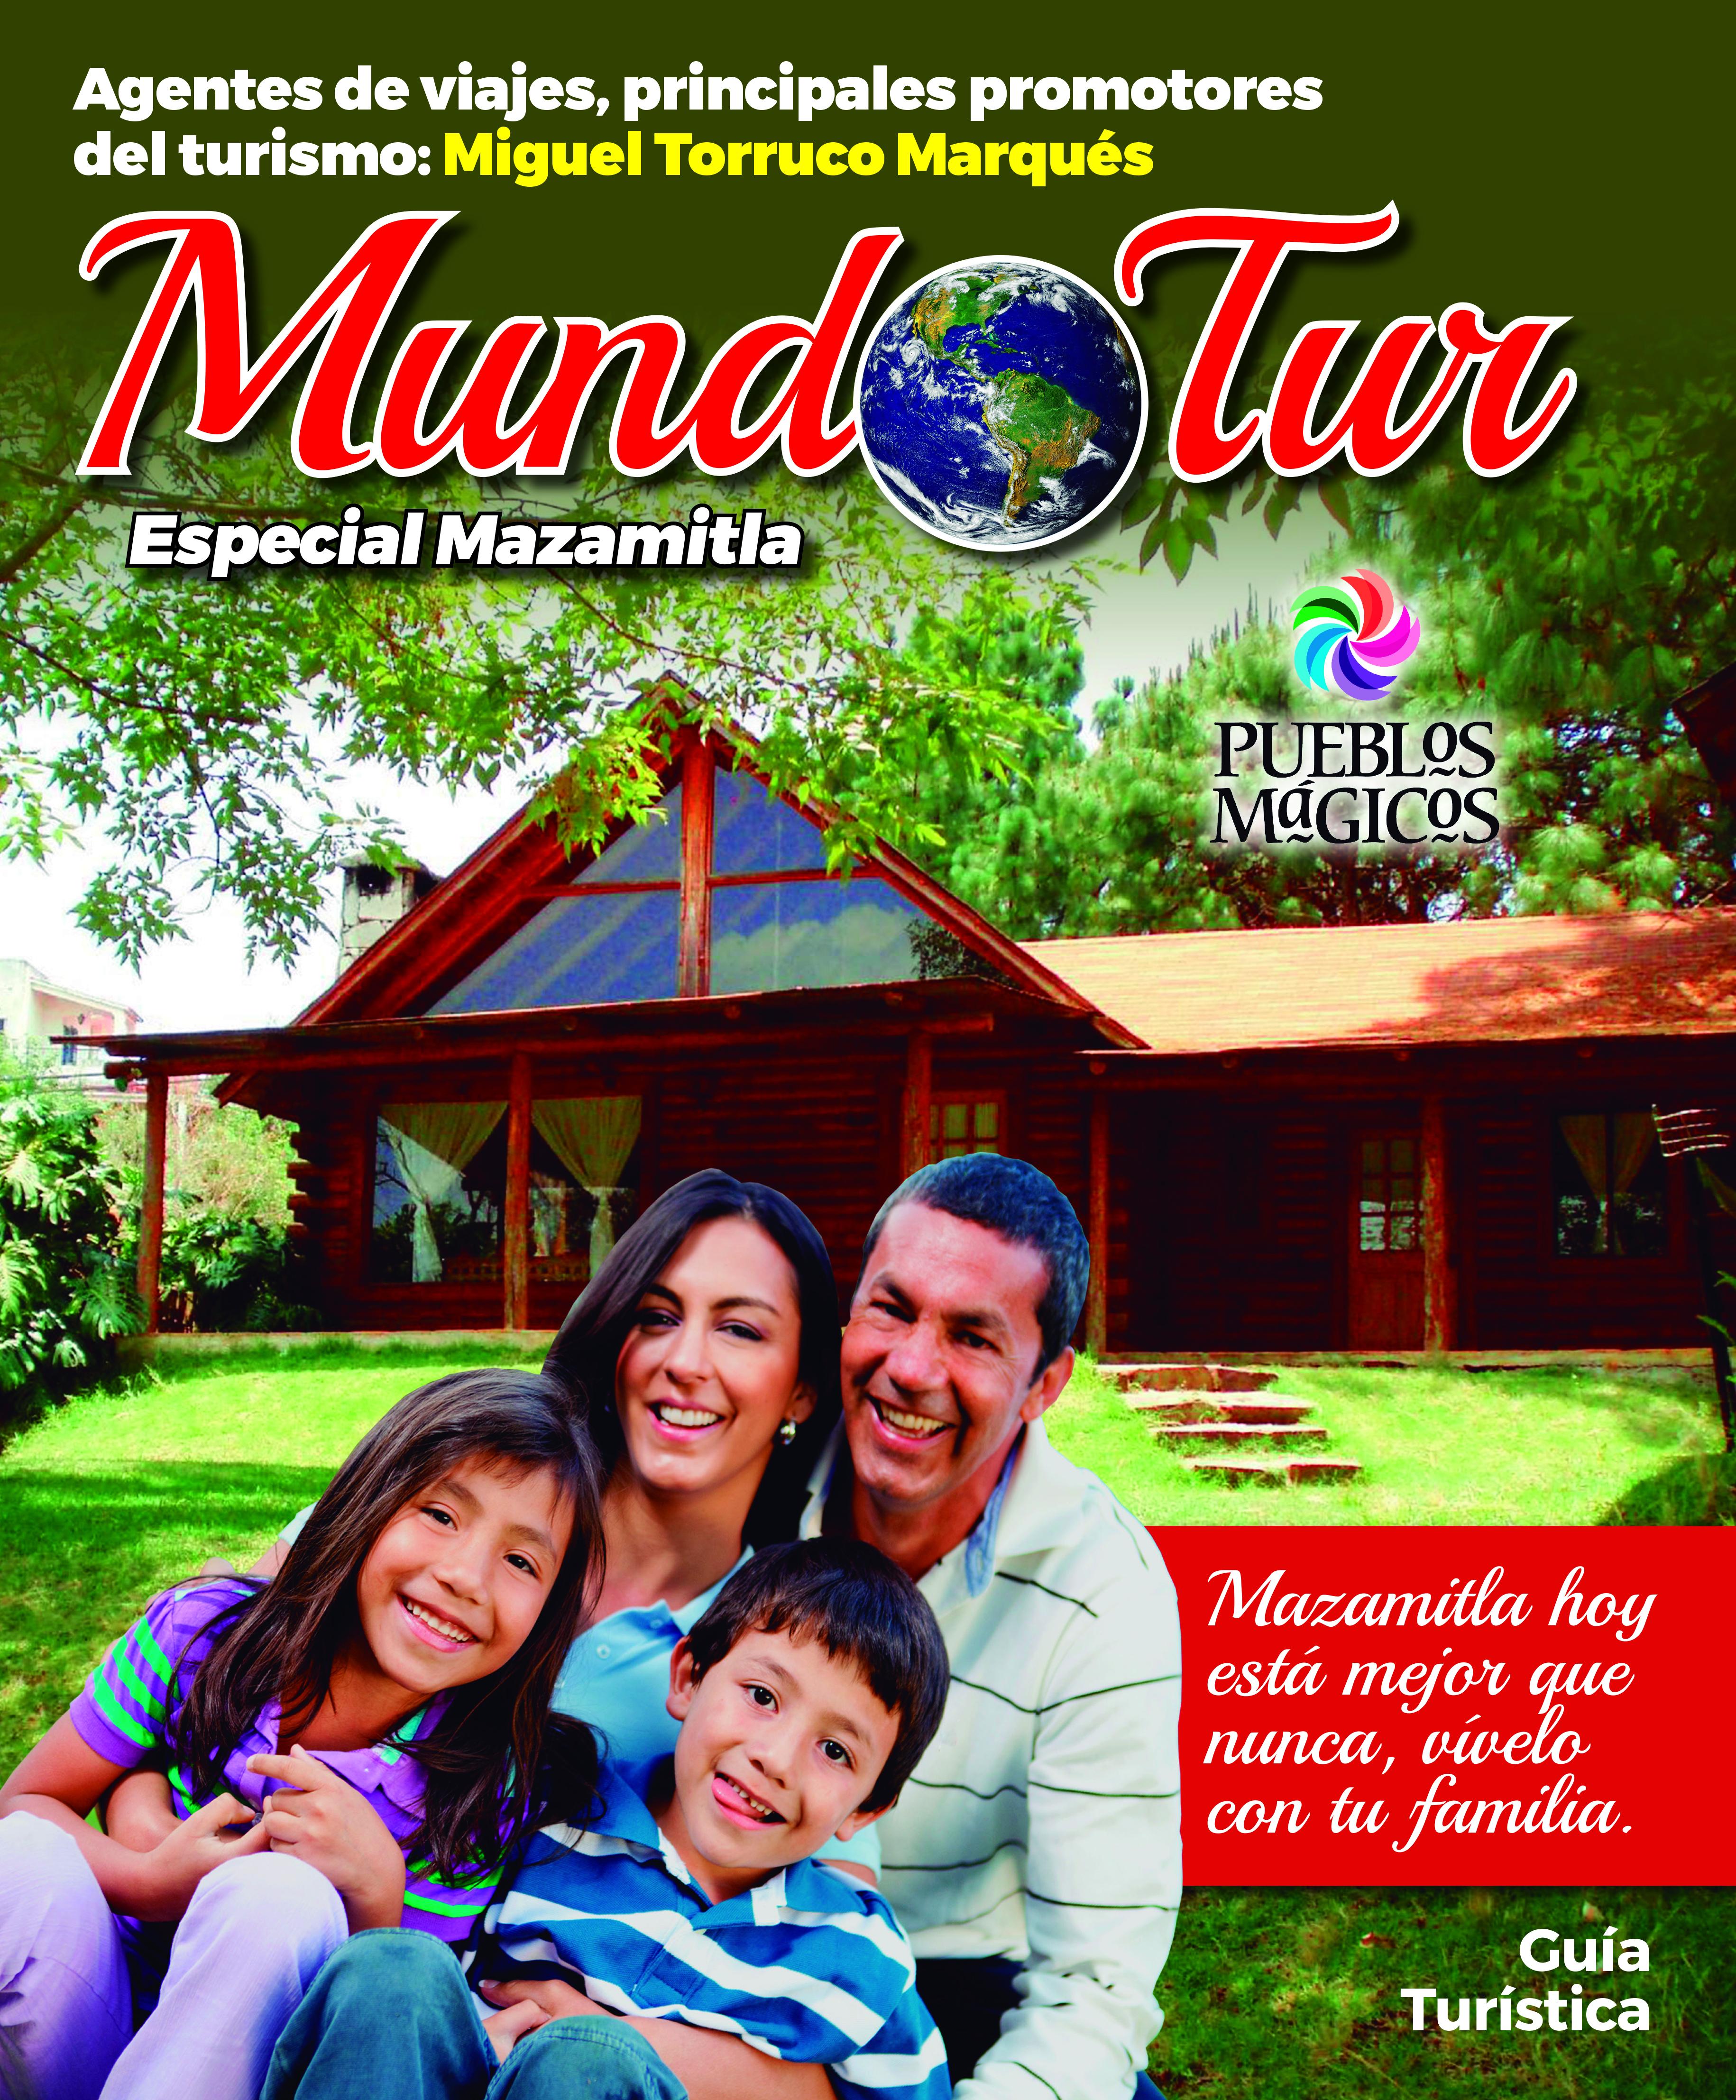 SUPLEMENTO ESPECIAL MUNDOTUR MAZAMITLA